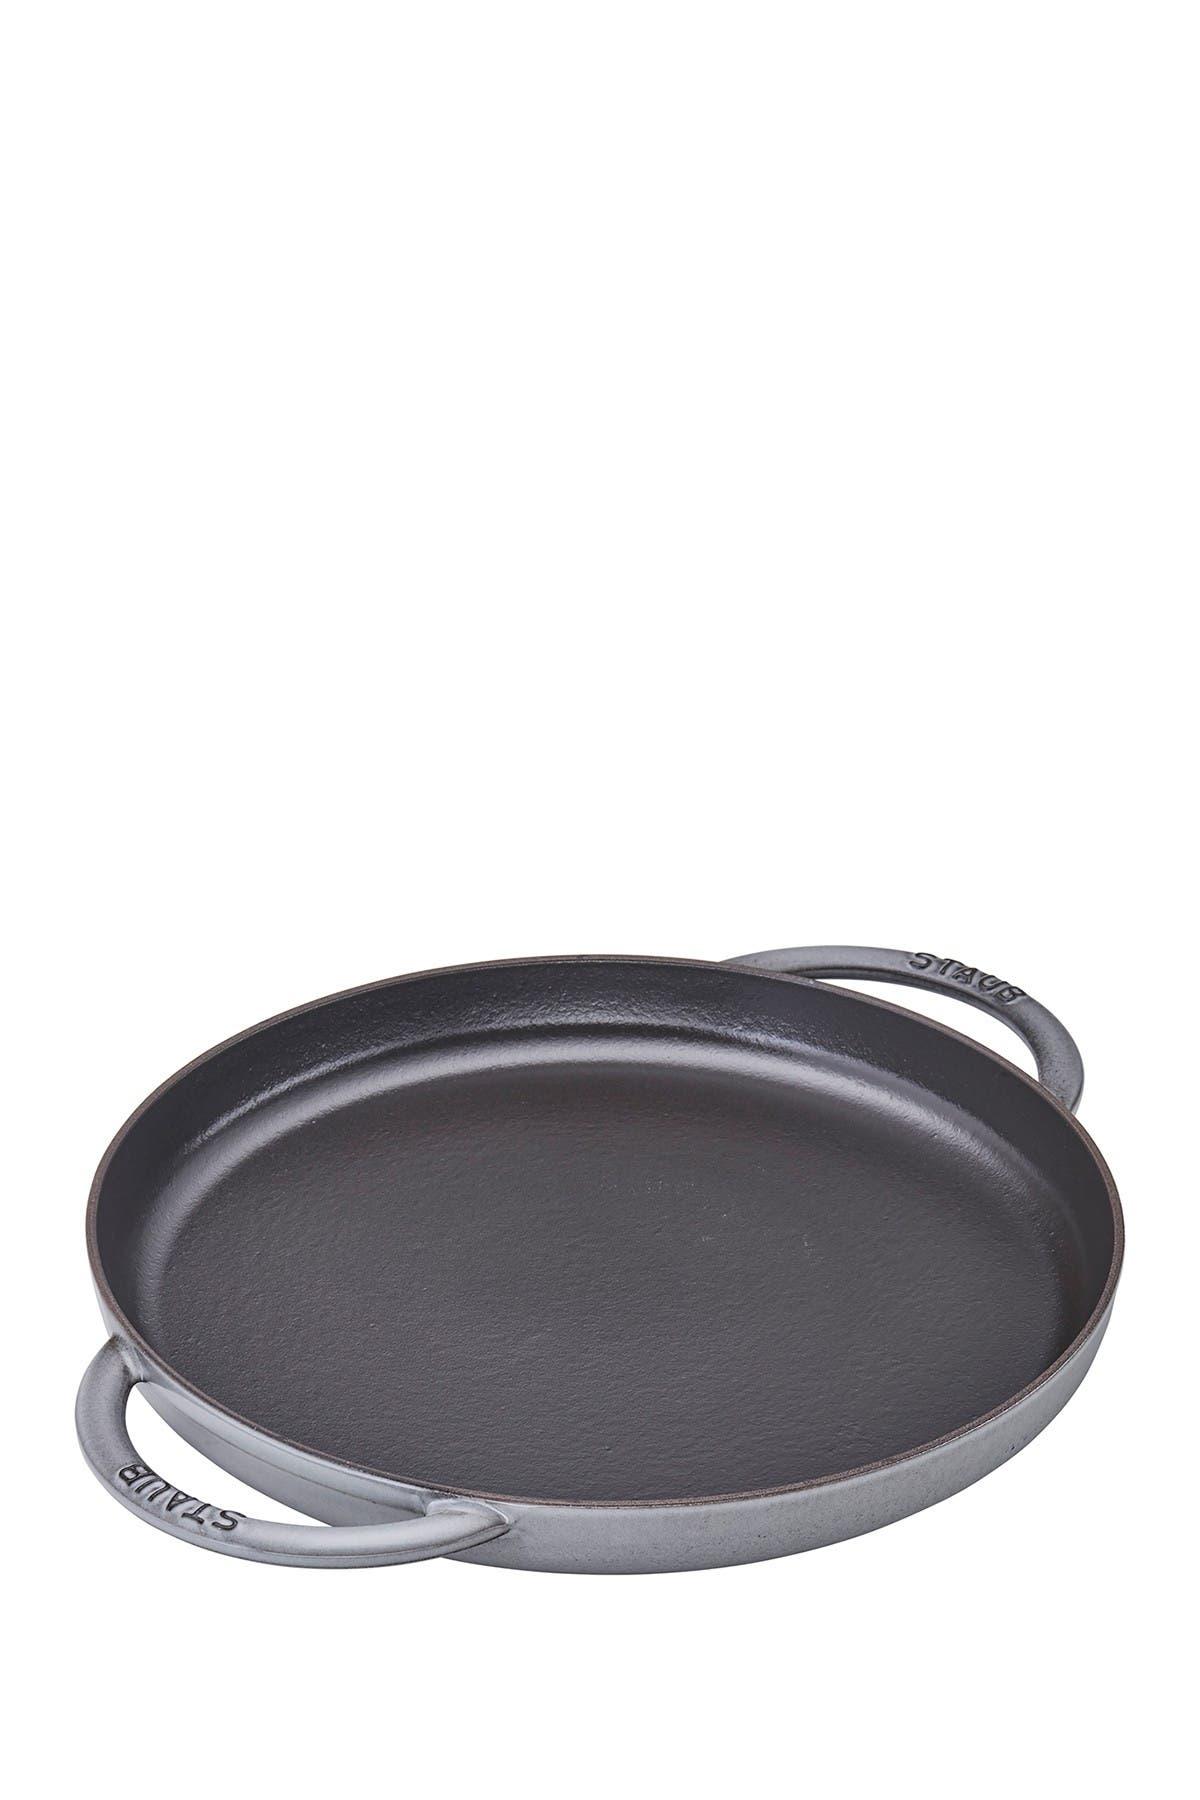 "Image of Staub Cast Iron 12"" Round Griddle Pan - Graphite"